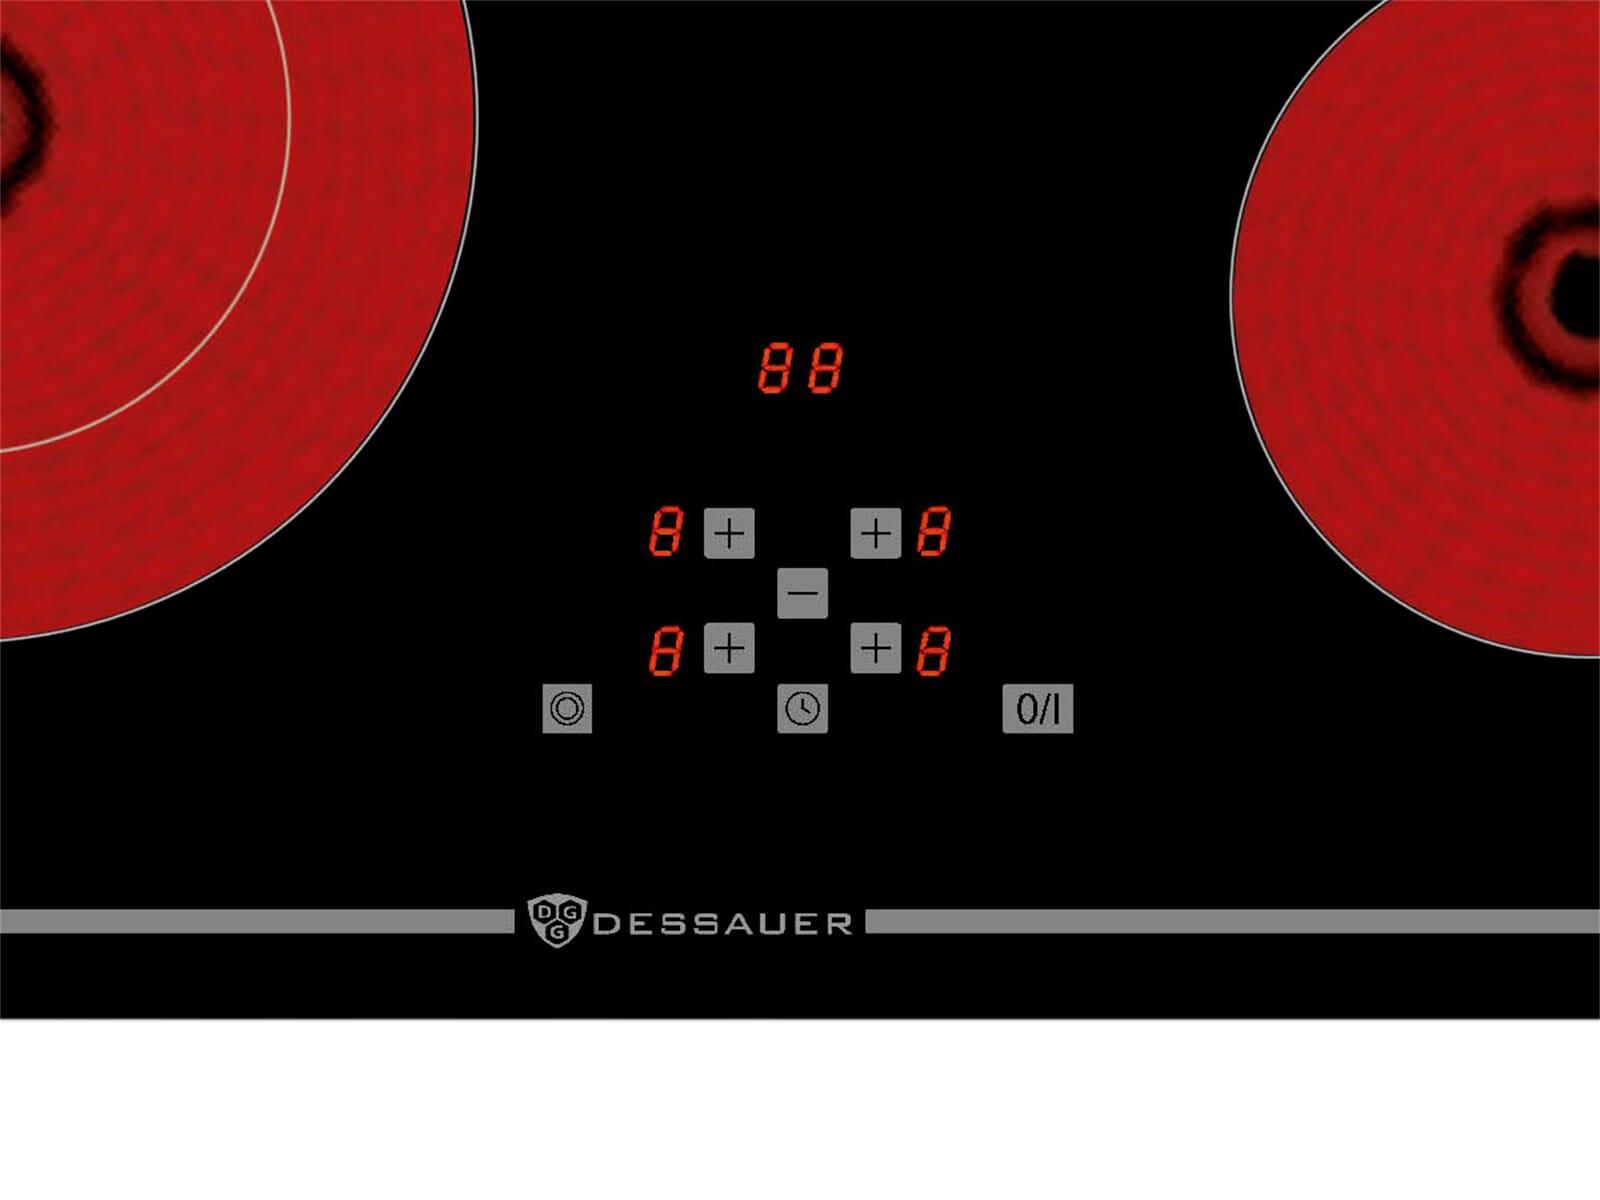 Dessauer KF 9972 60 Glaskeramikkochfeld autark